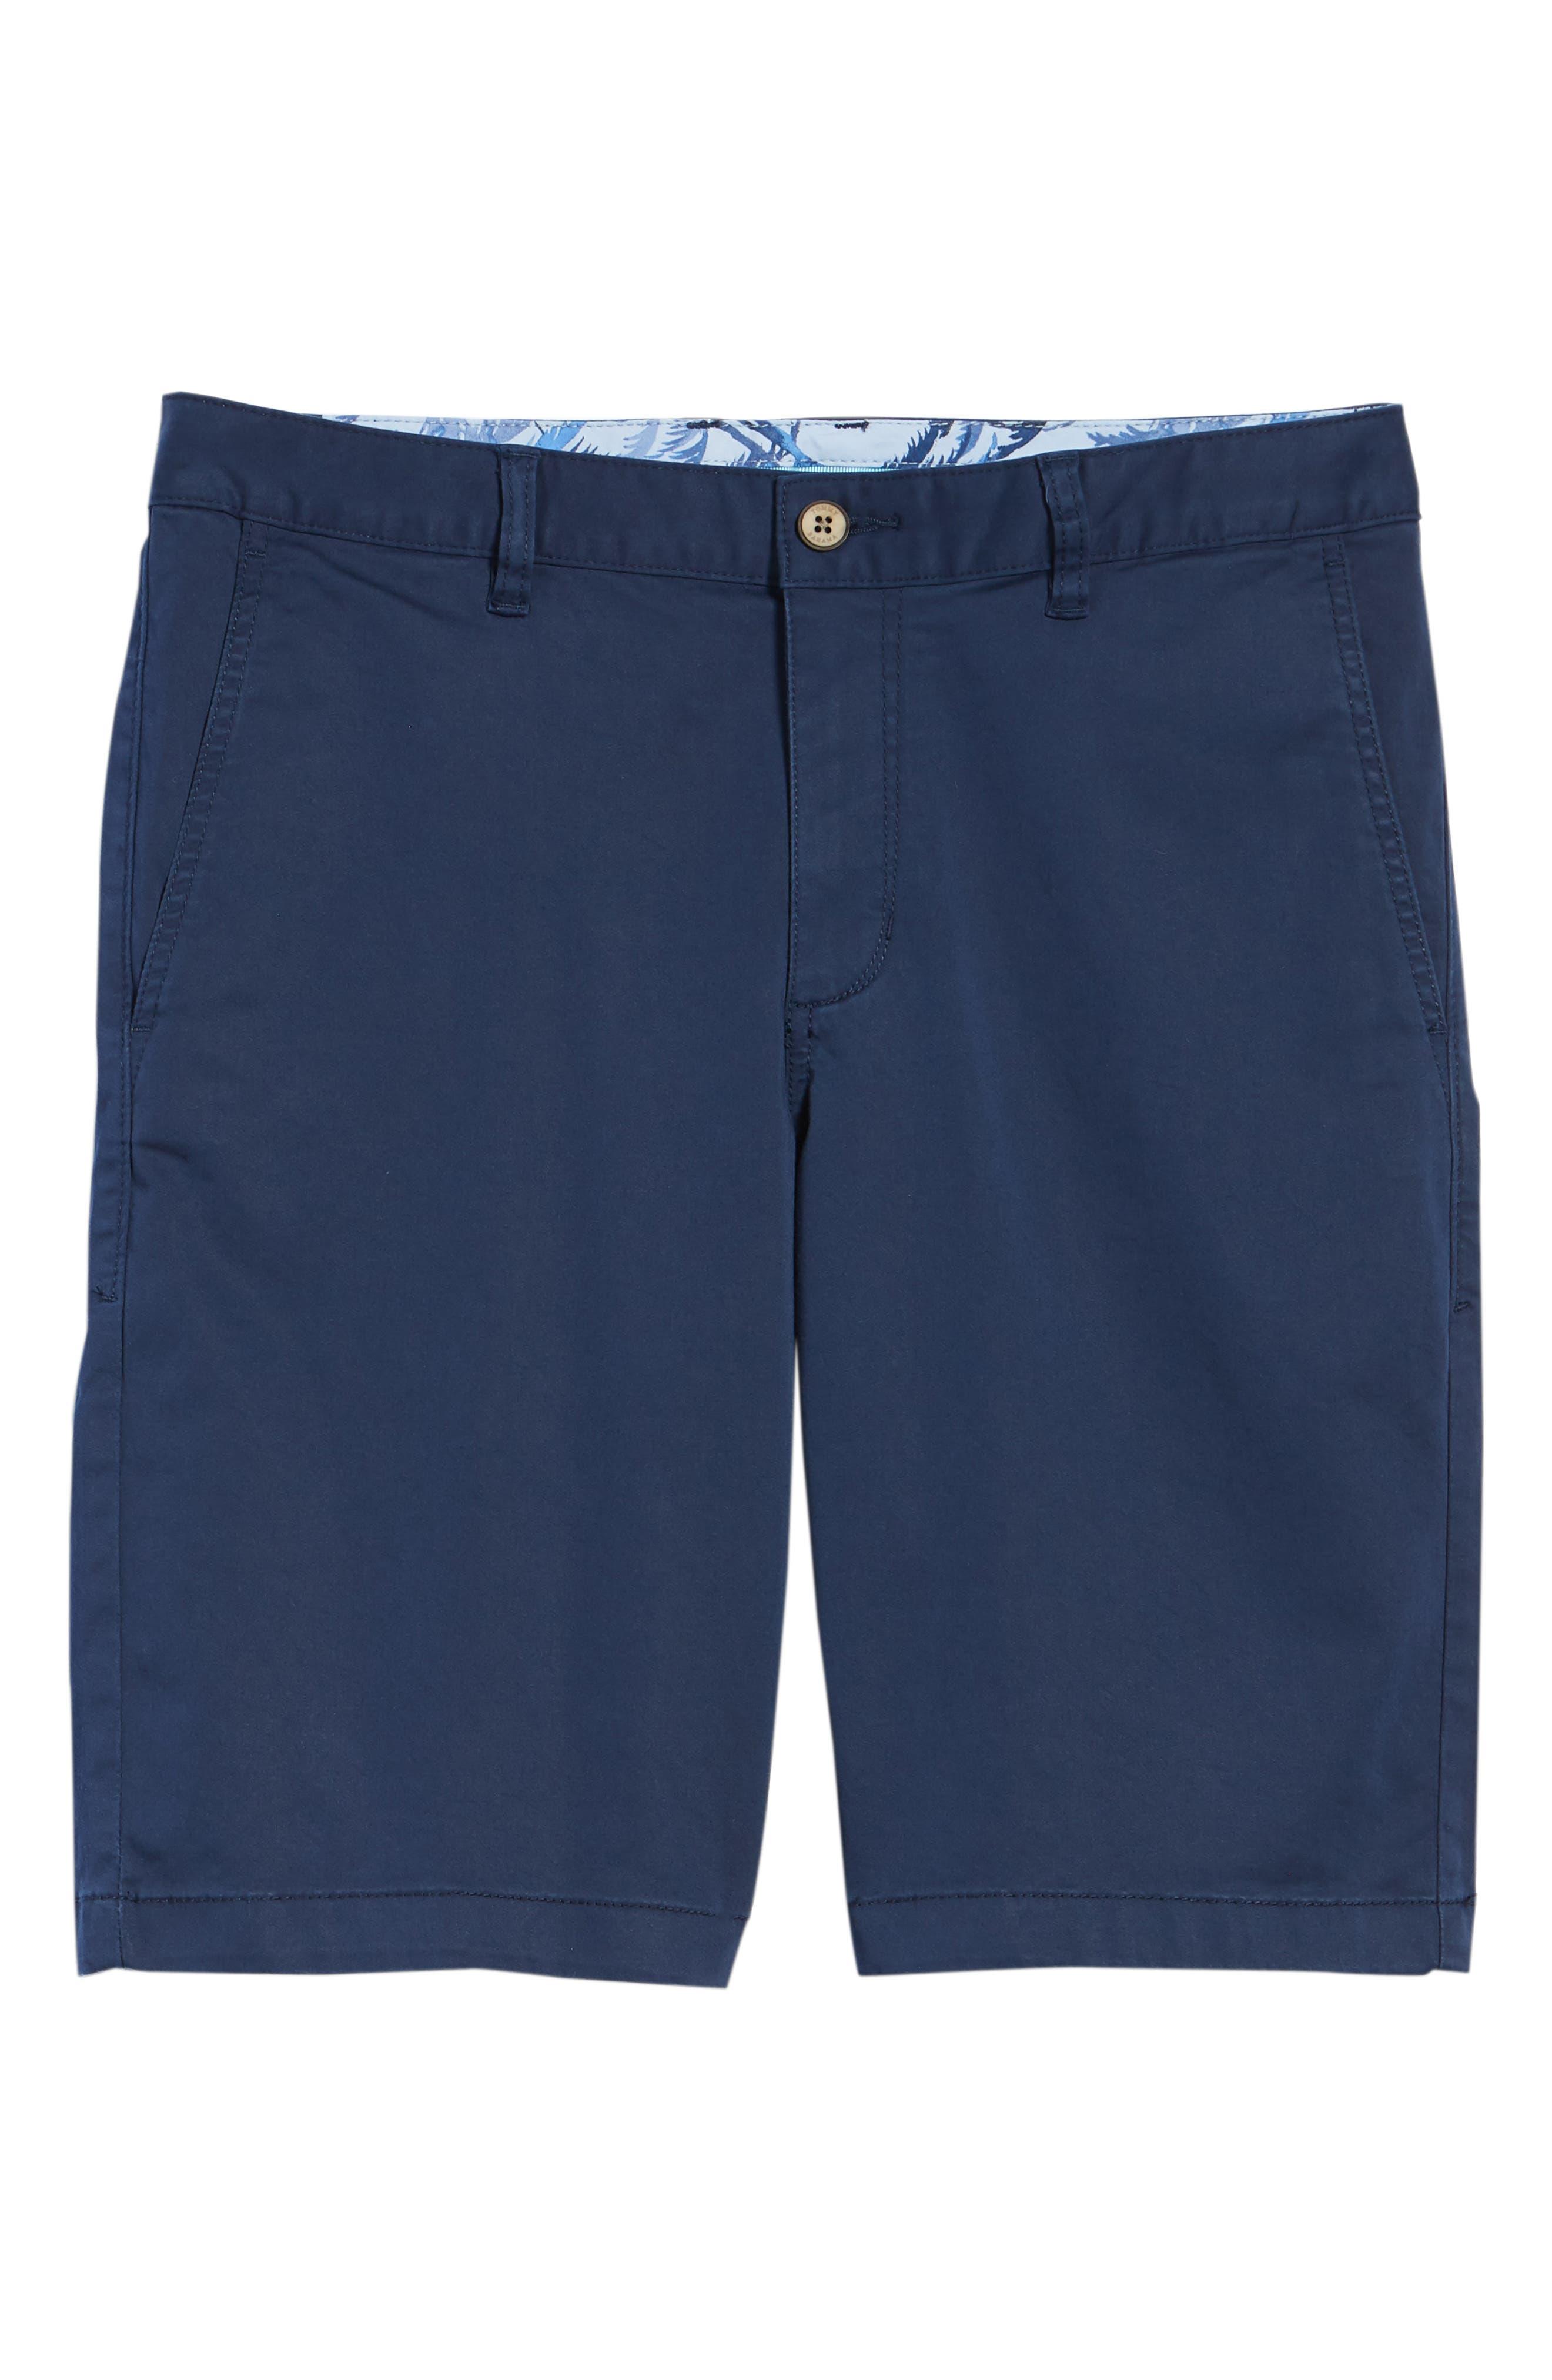 Boracay Chino Shorts,                             Alternate thumbnail 47, color,